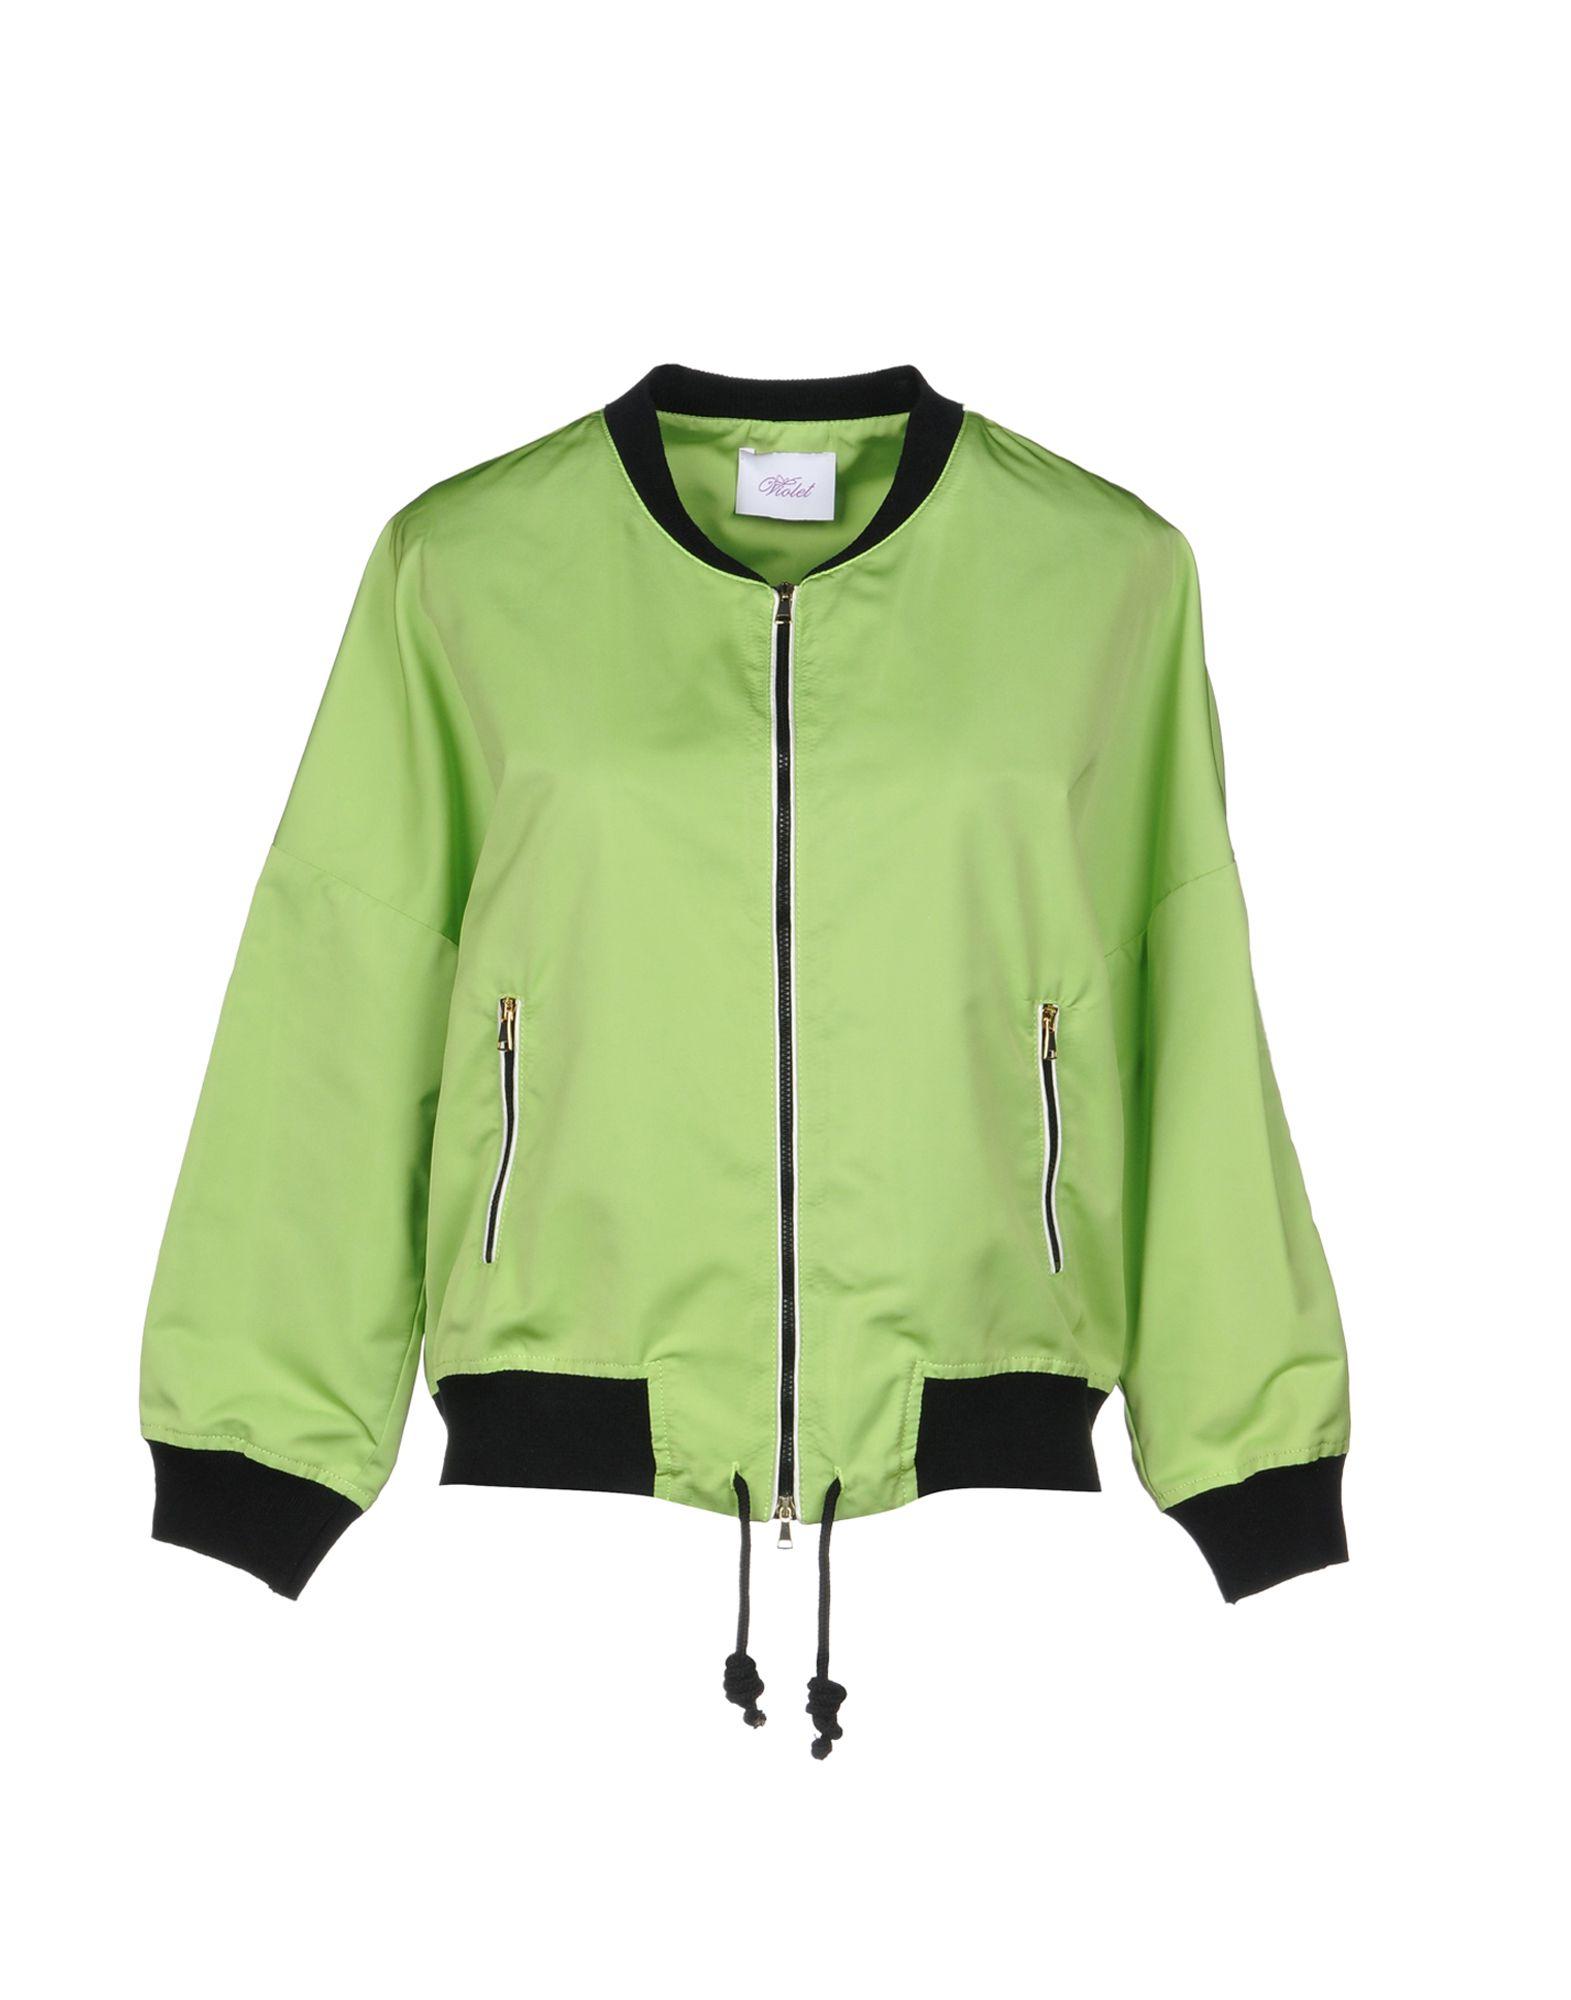 VIOLET ATOS LOMBARDINI Куртка плавки nirey для мальчика цвет синий